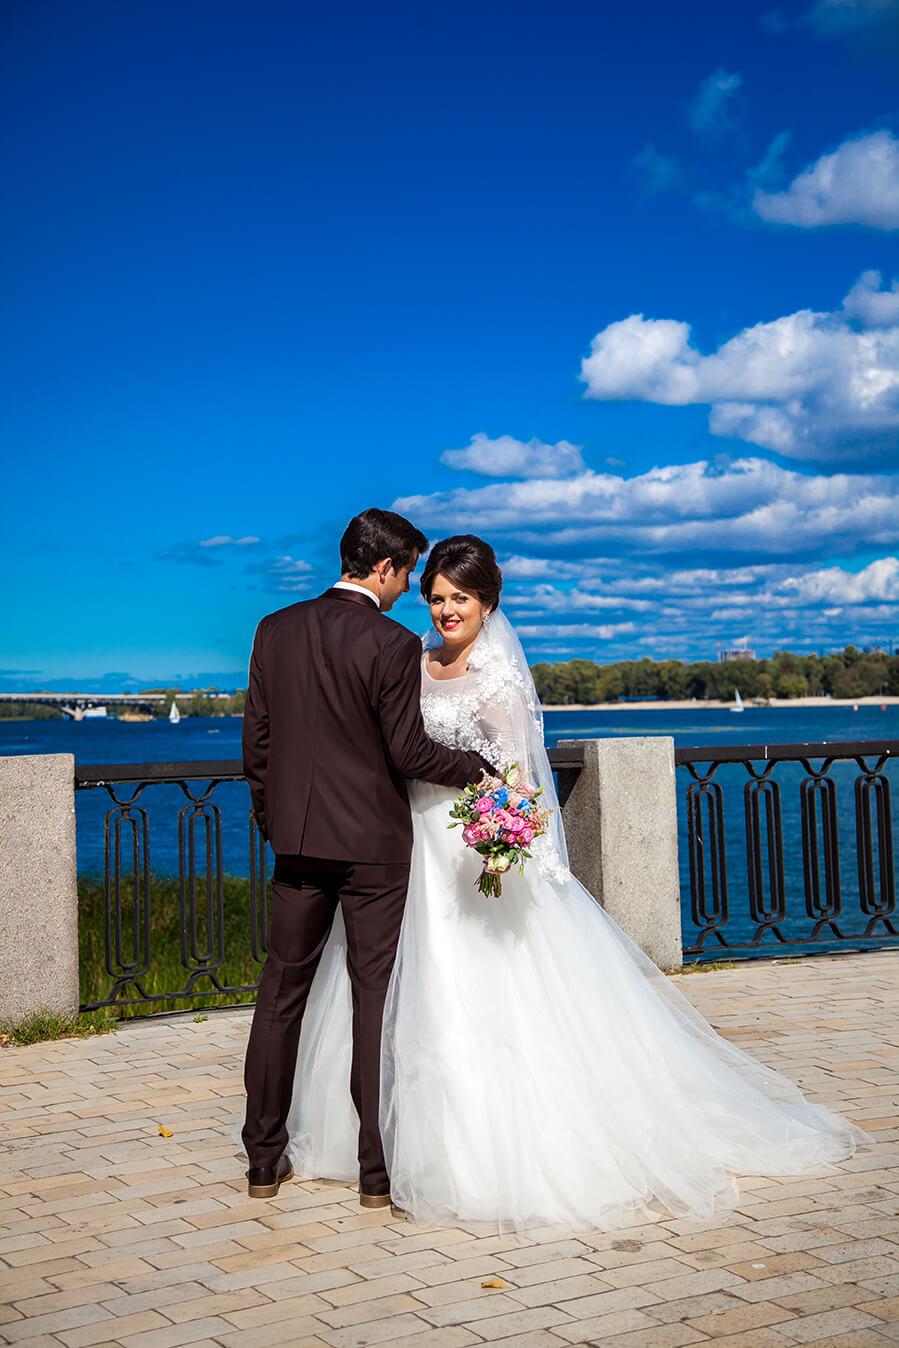 svadebnyj-fotograf-videooperator-kiev-svadebnaja-progulka-mesta-dlja-svadebnoj-fotosessii-3